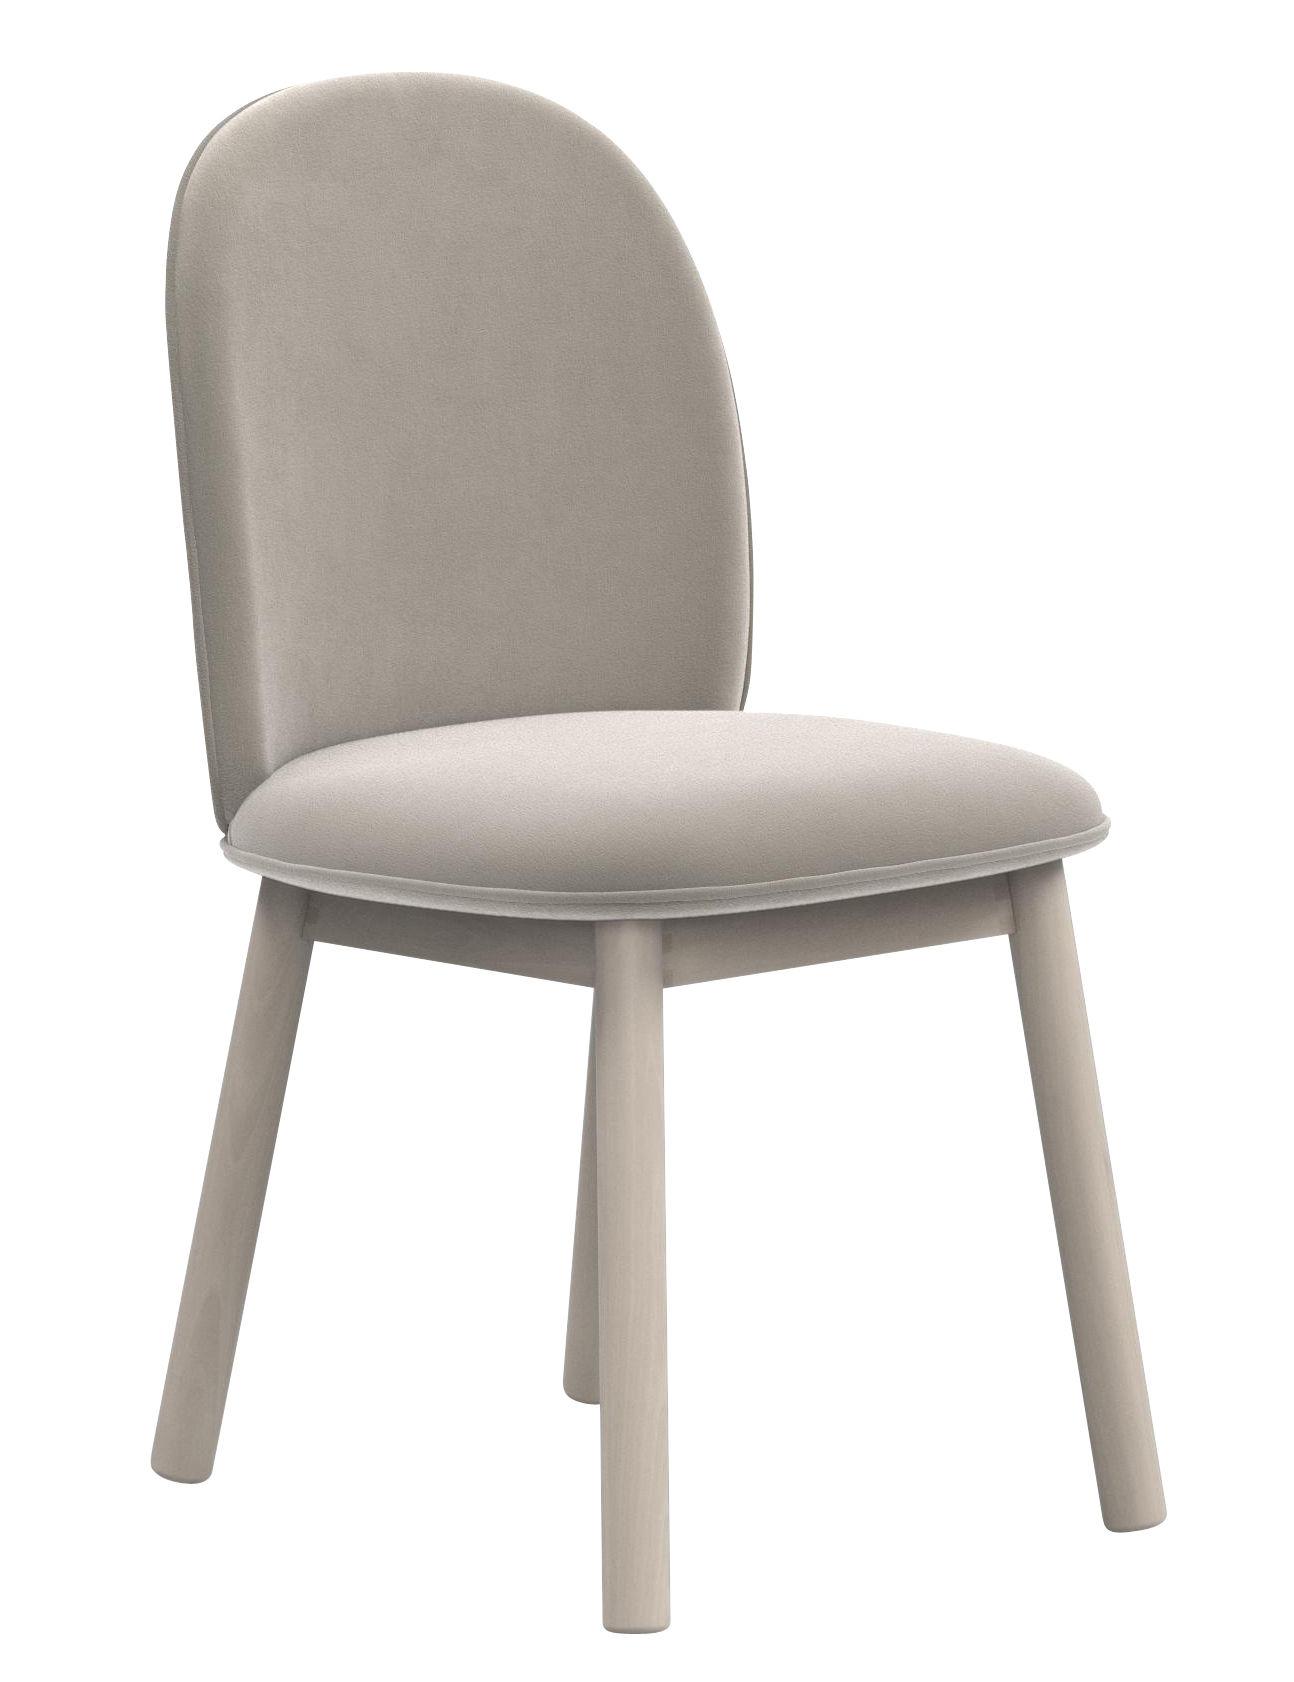 chaise rembourr e ace velours bois velours beige normann copenhagen made in design. Black Bedroom Furniture Sets. Home Design Ideas